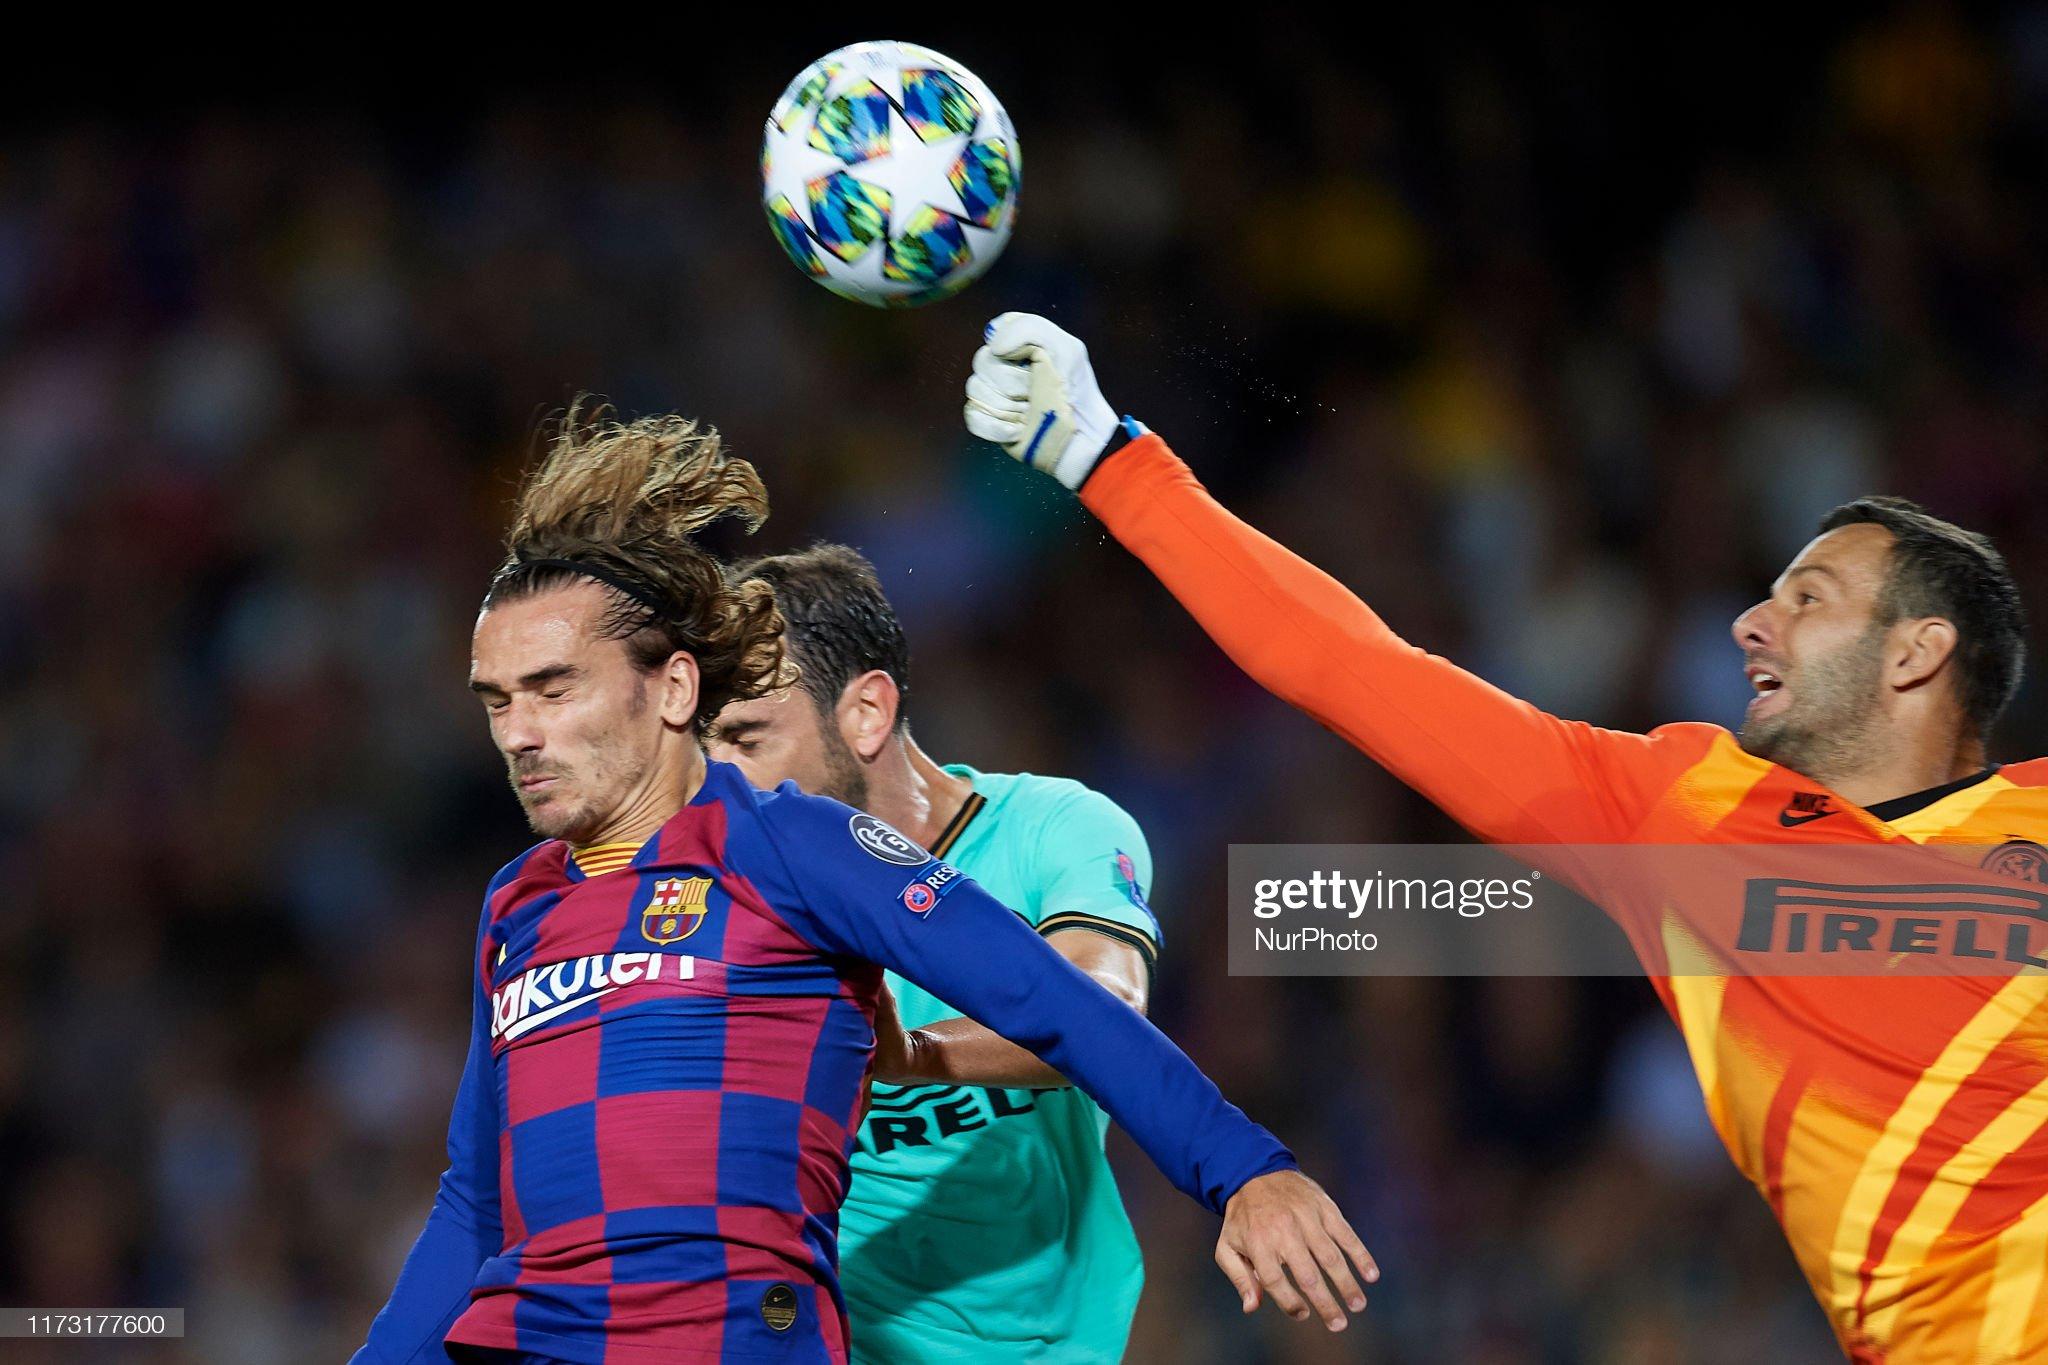 صور مباراة : برشلونة - إنتر 2-1 ( 02-10-2019 )  Samir-handanovic-of-inter-of-milan-makes-a-save-front-antoine-of-picture-id1173177600?s=2048x2048